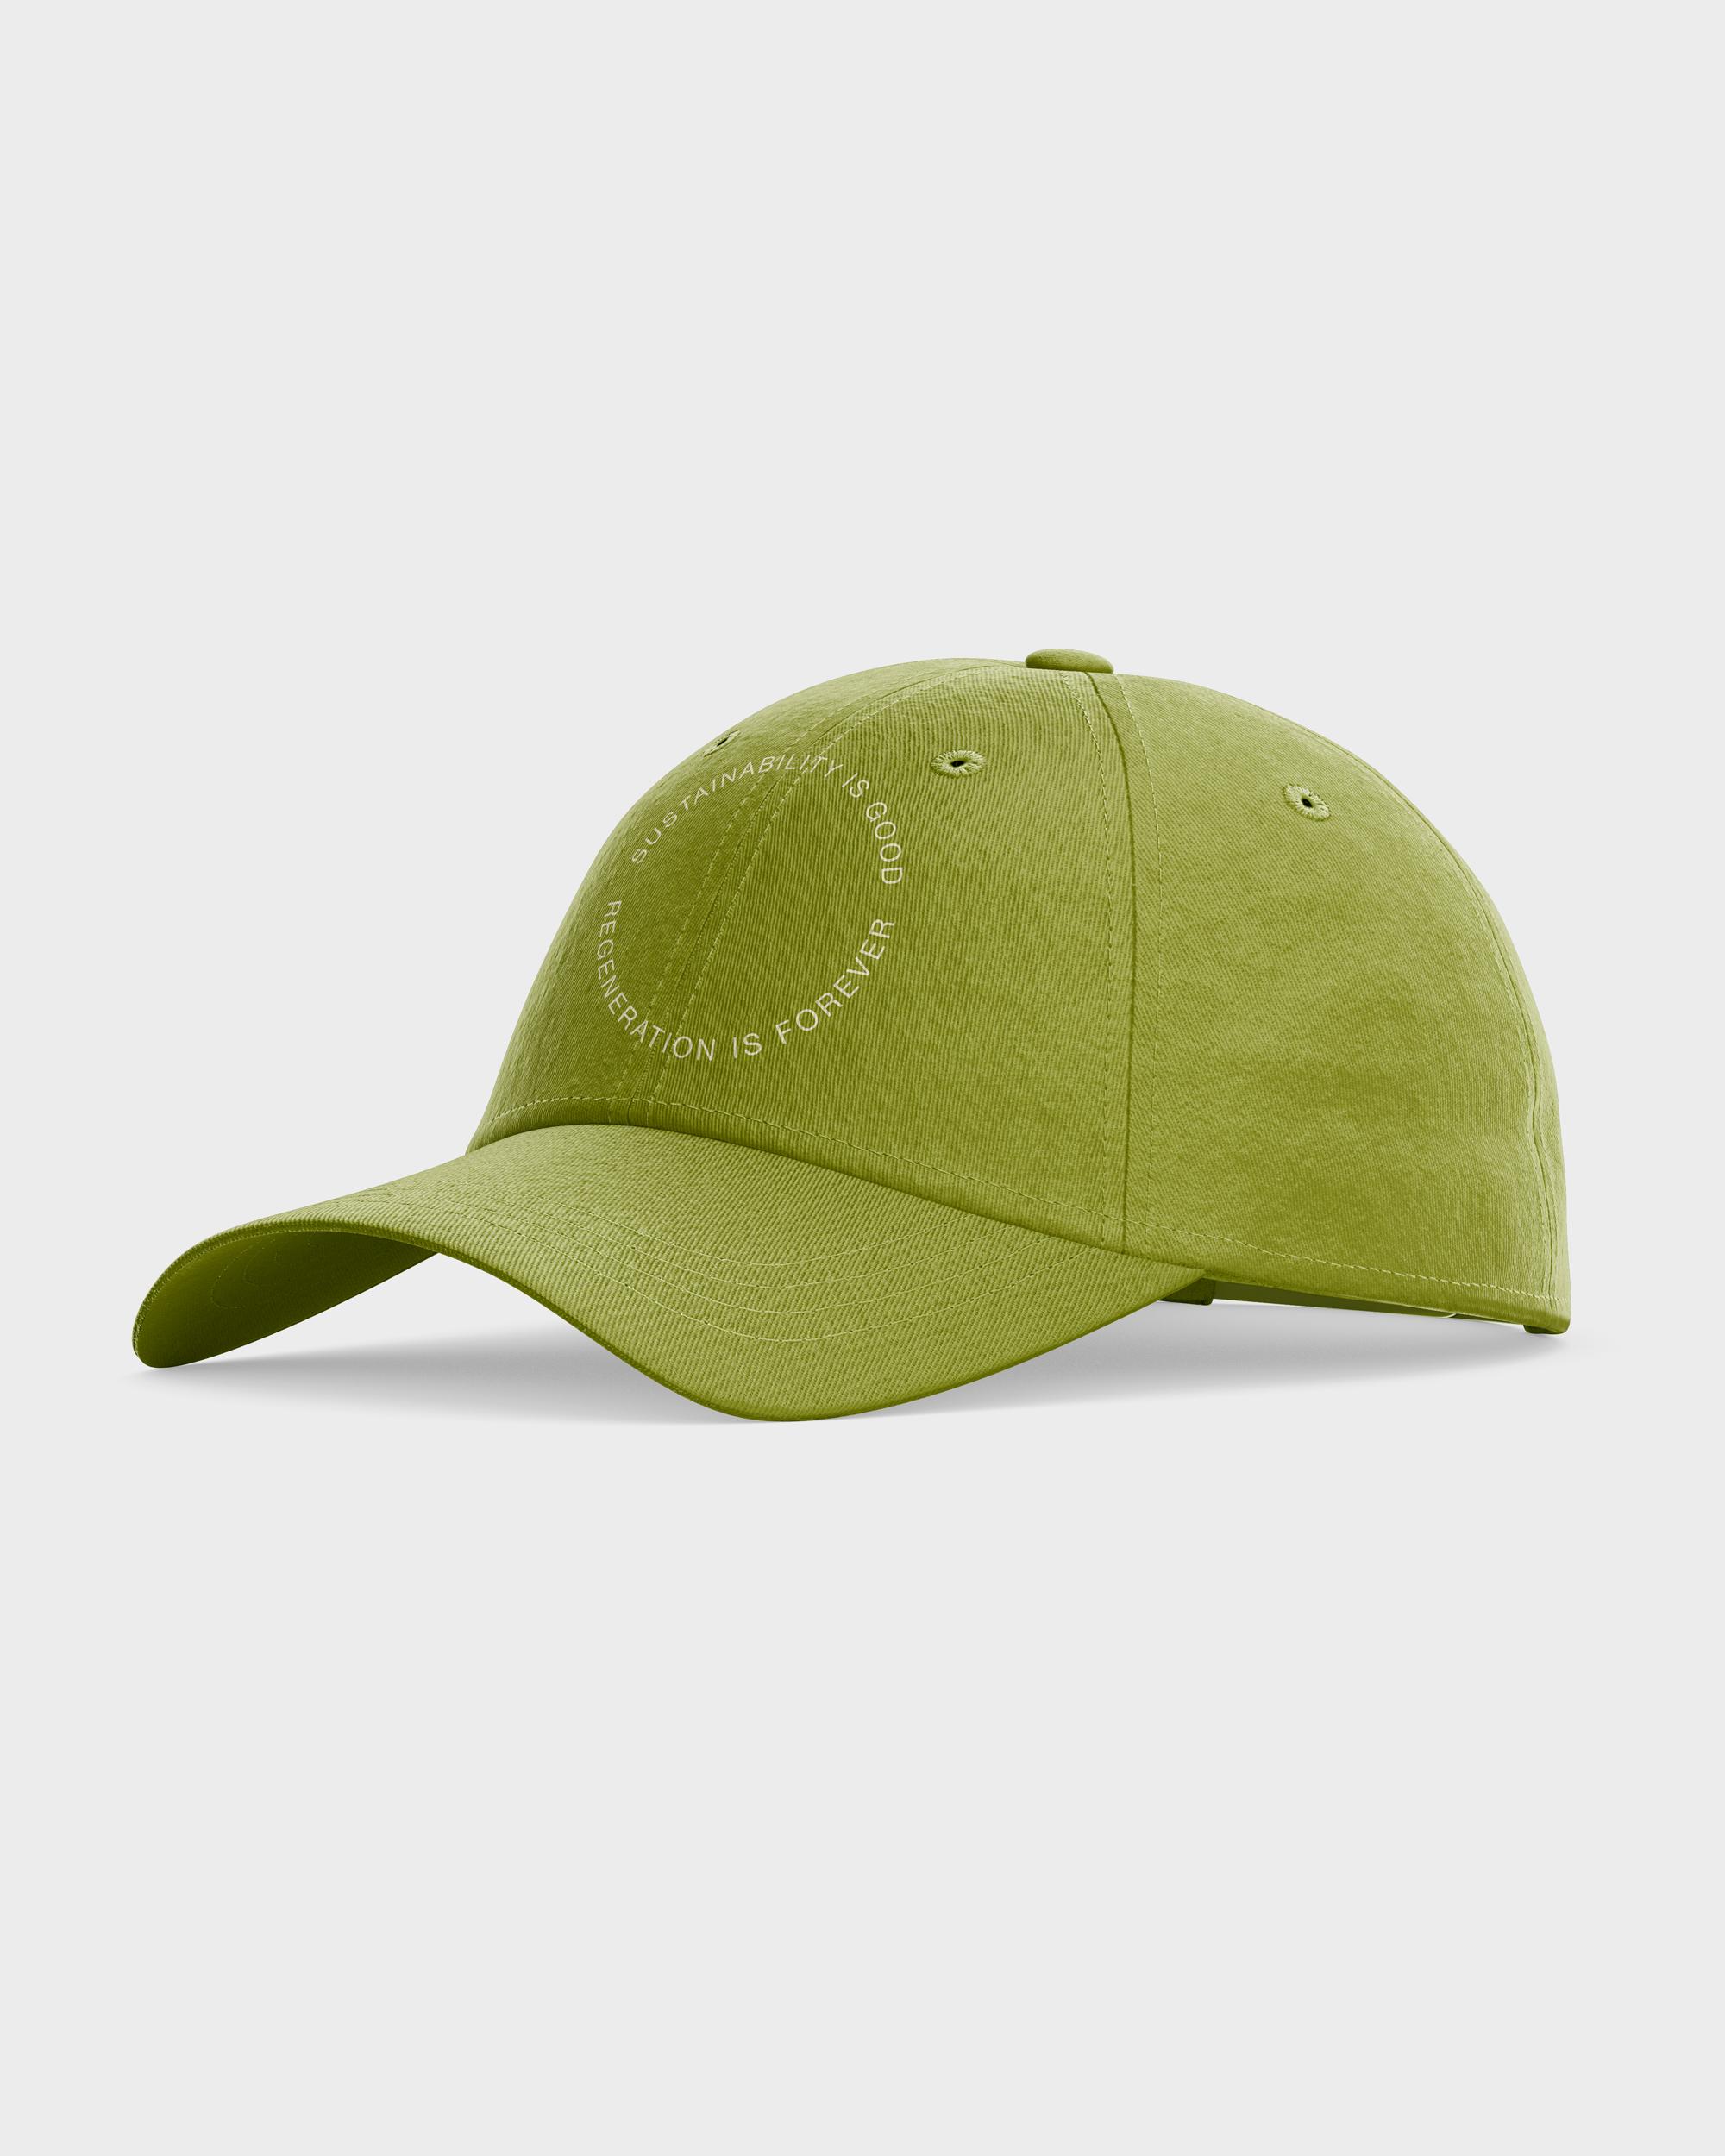 Hudson Hemp Cap